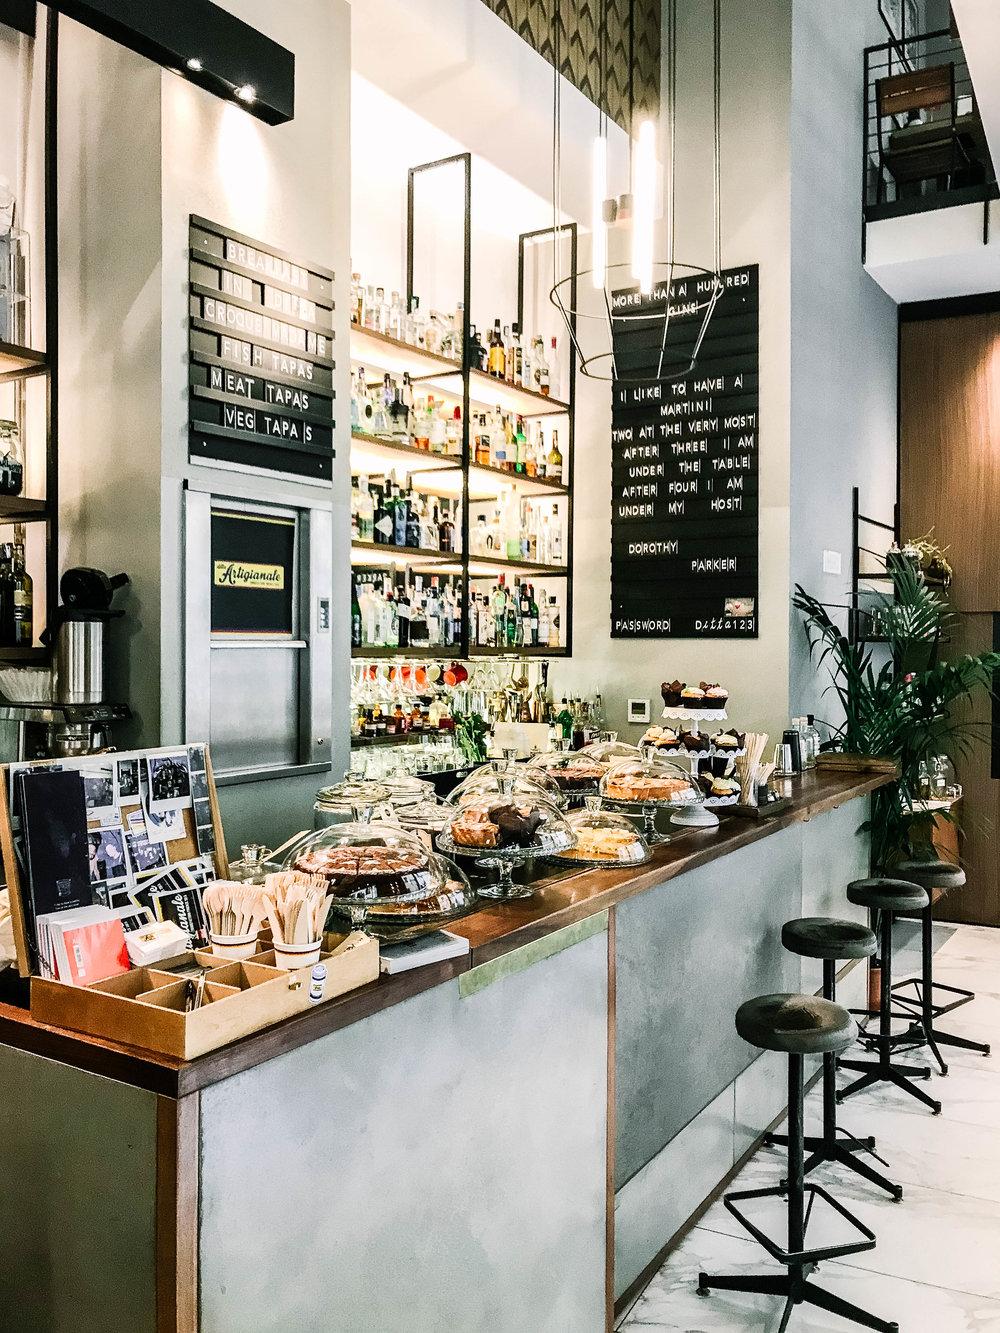 Italian Coffee Break - @ ditta artiginale